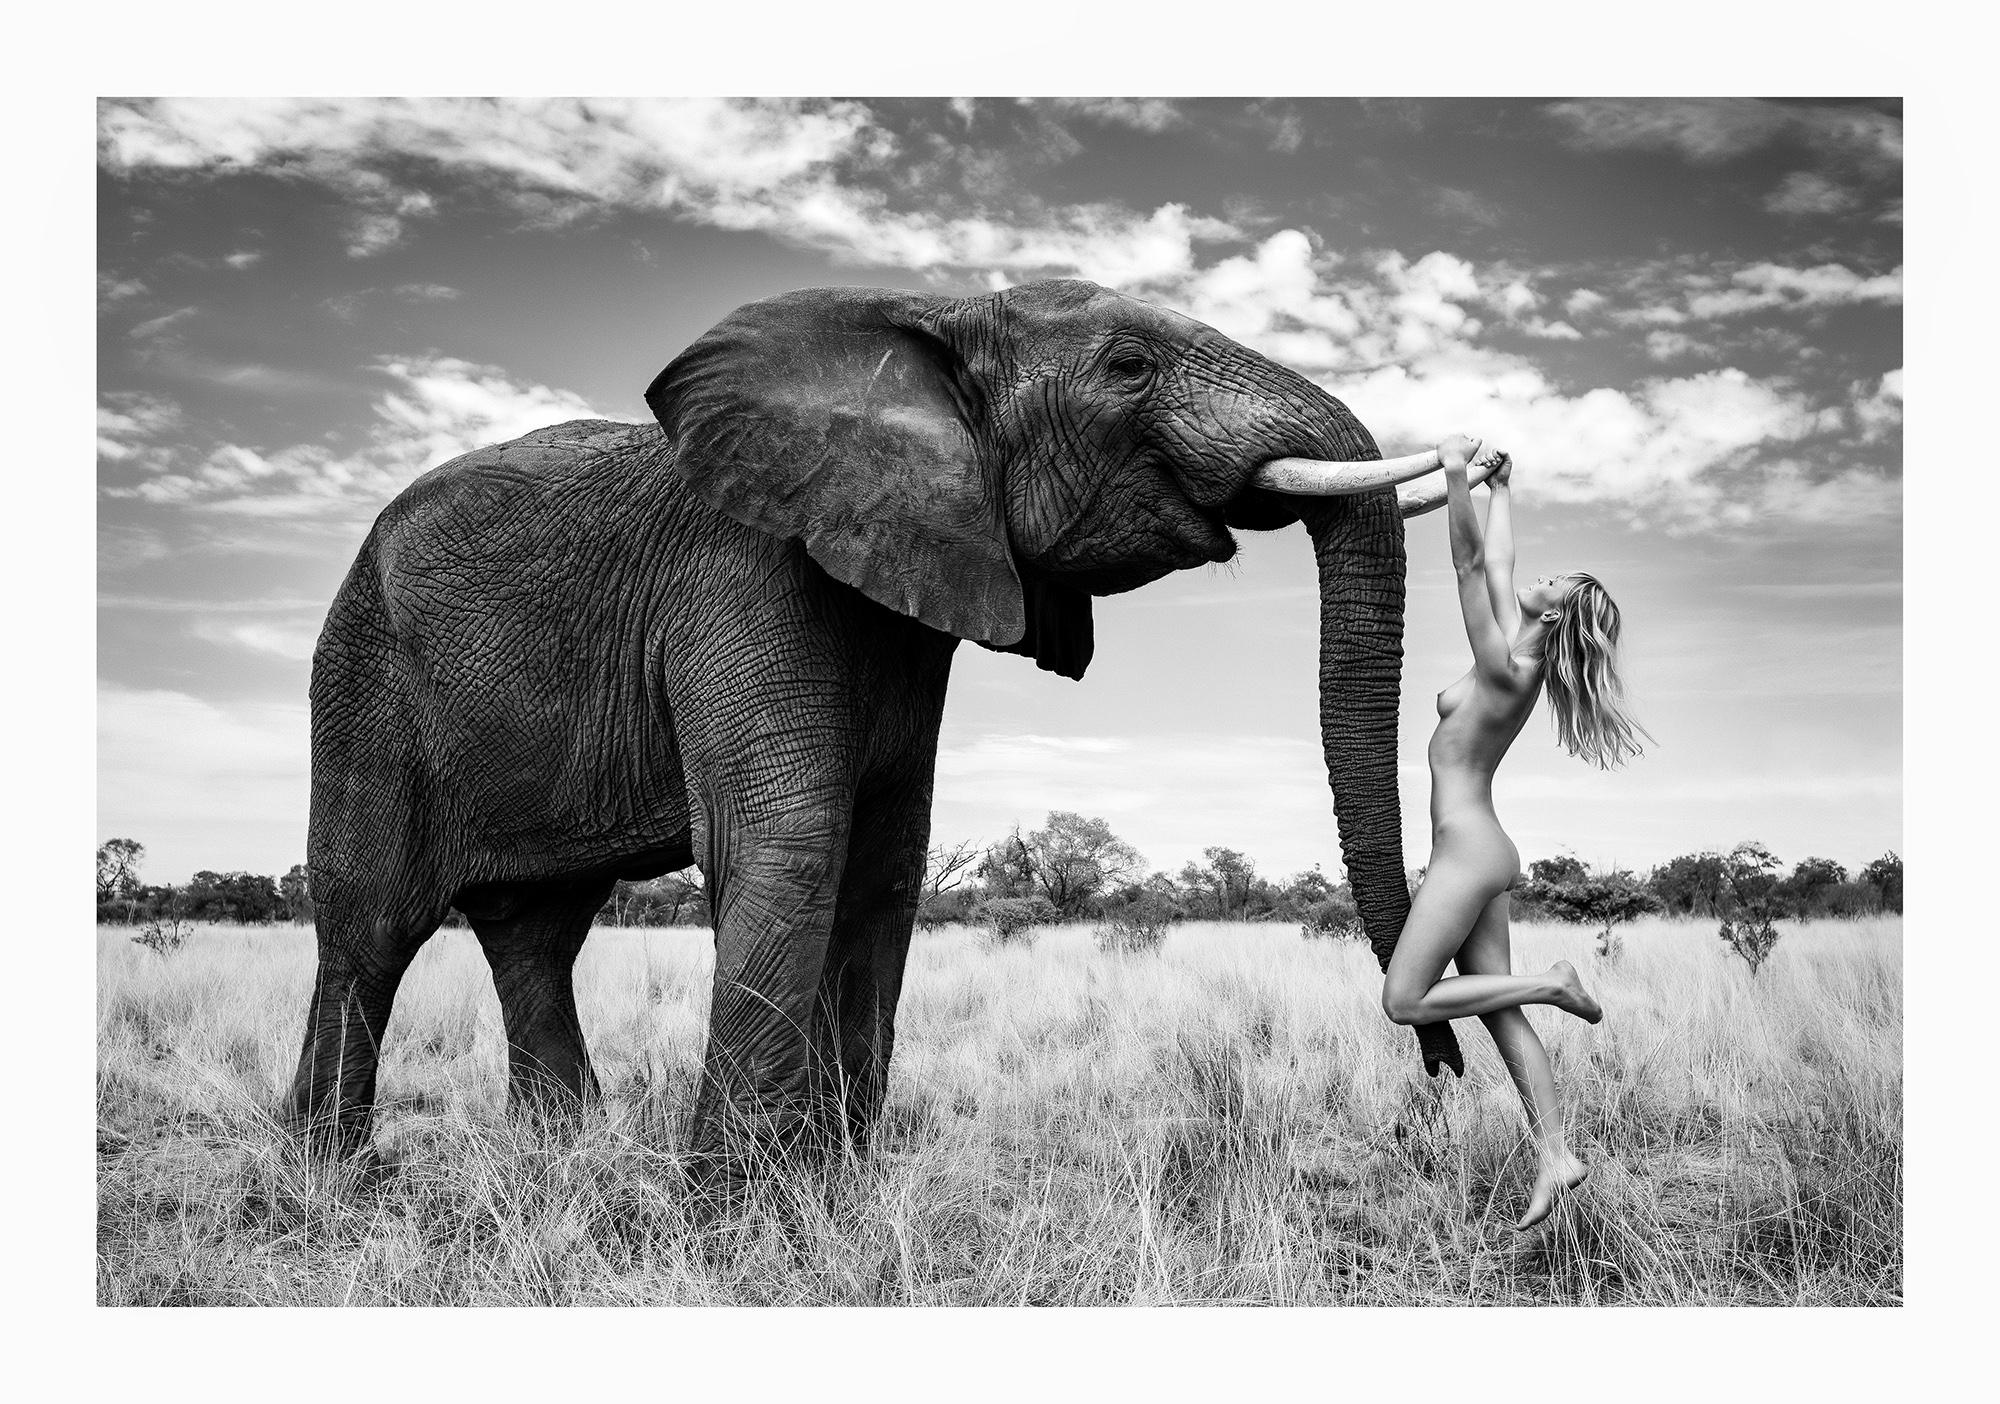 12 Natural Wonders in Afrika von Paul Giggle 1